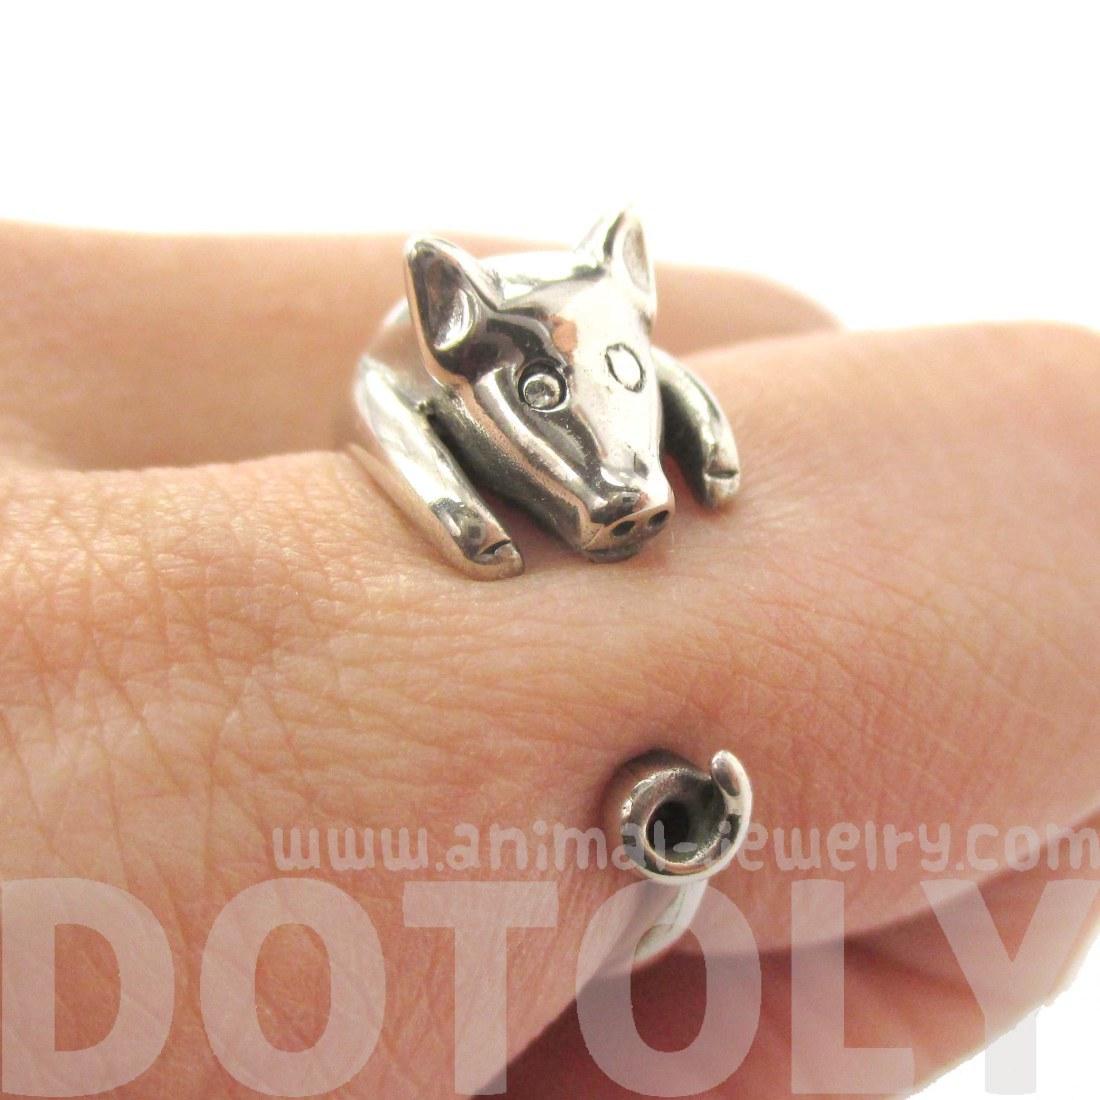 miniature piglet pig animal wrap ring in 925 sterling